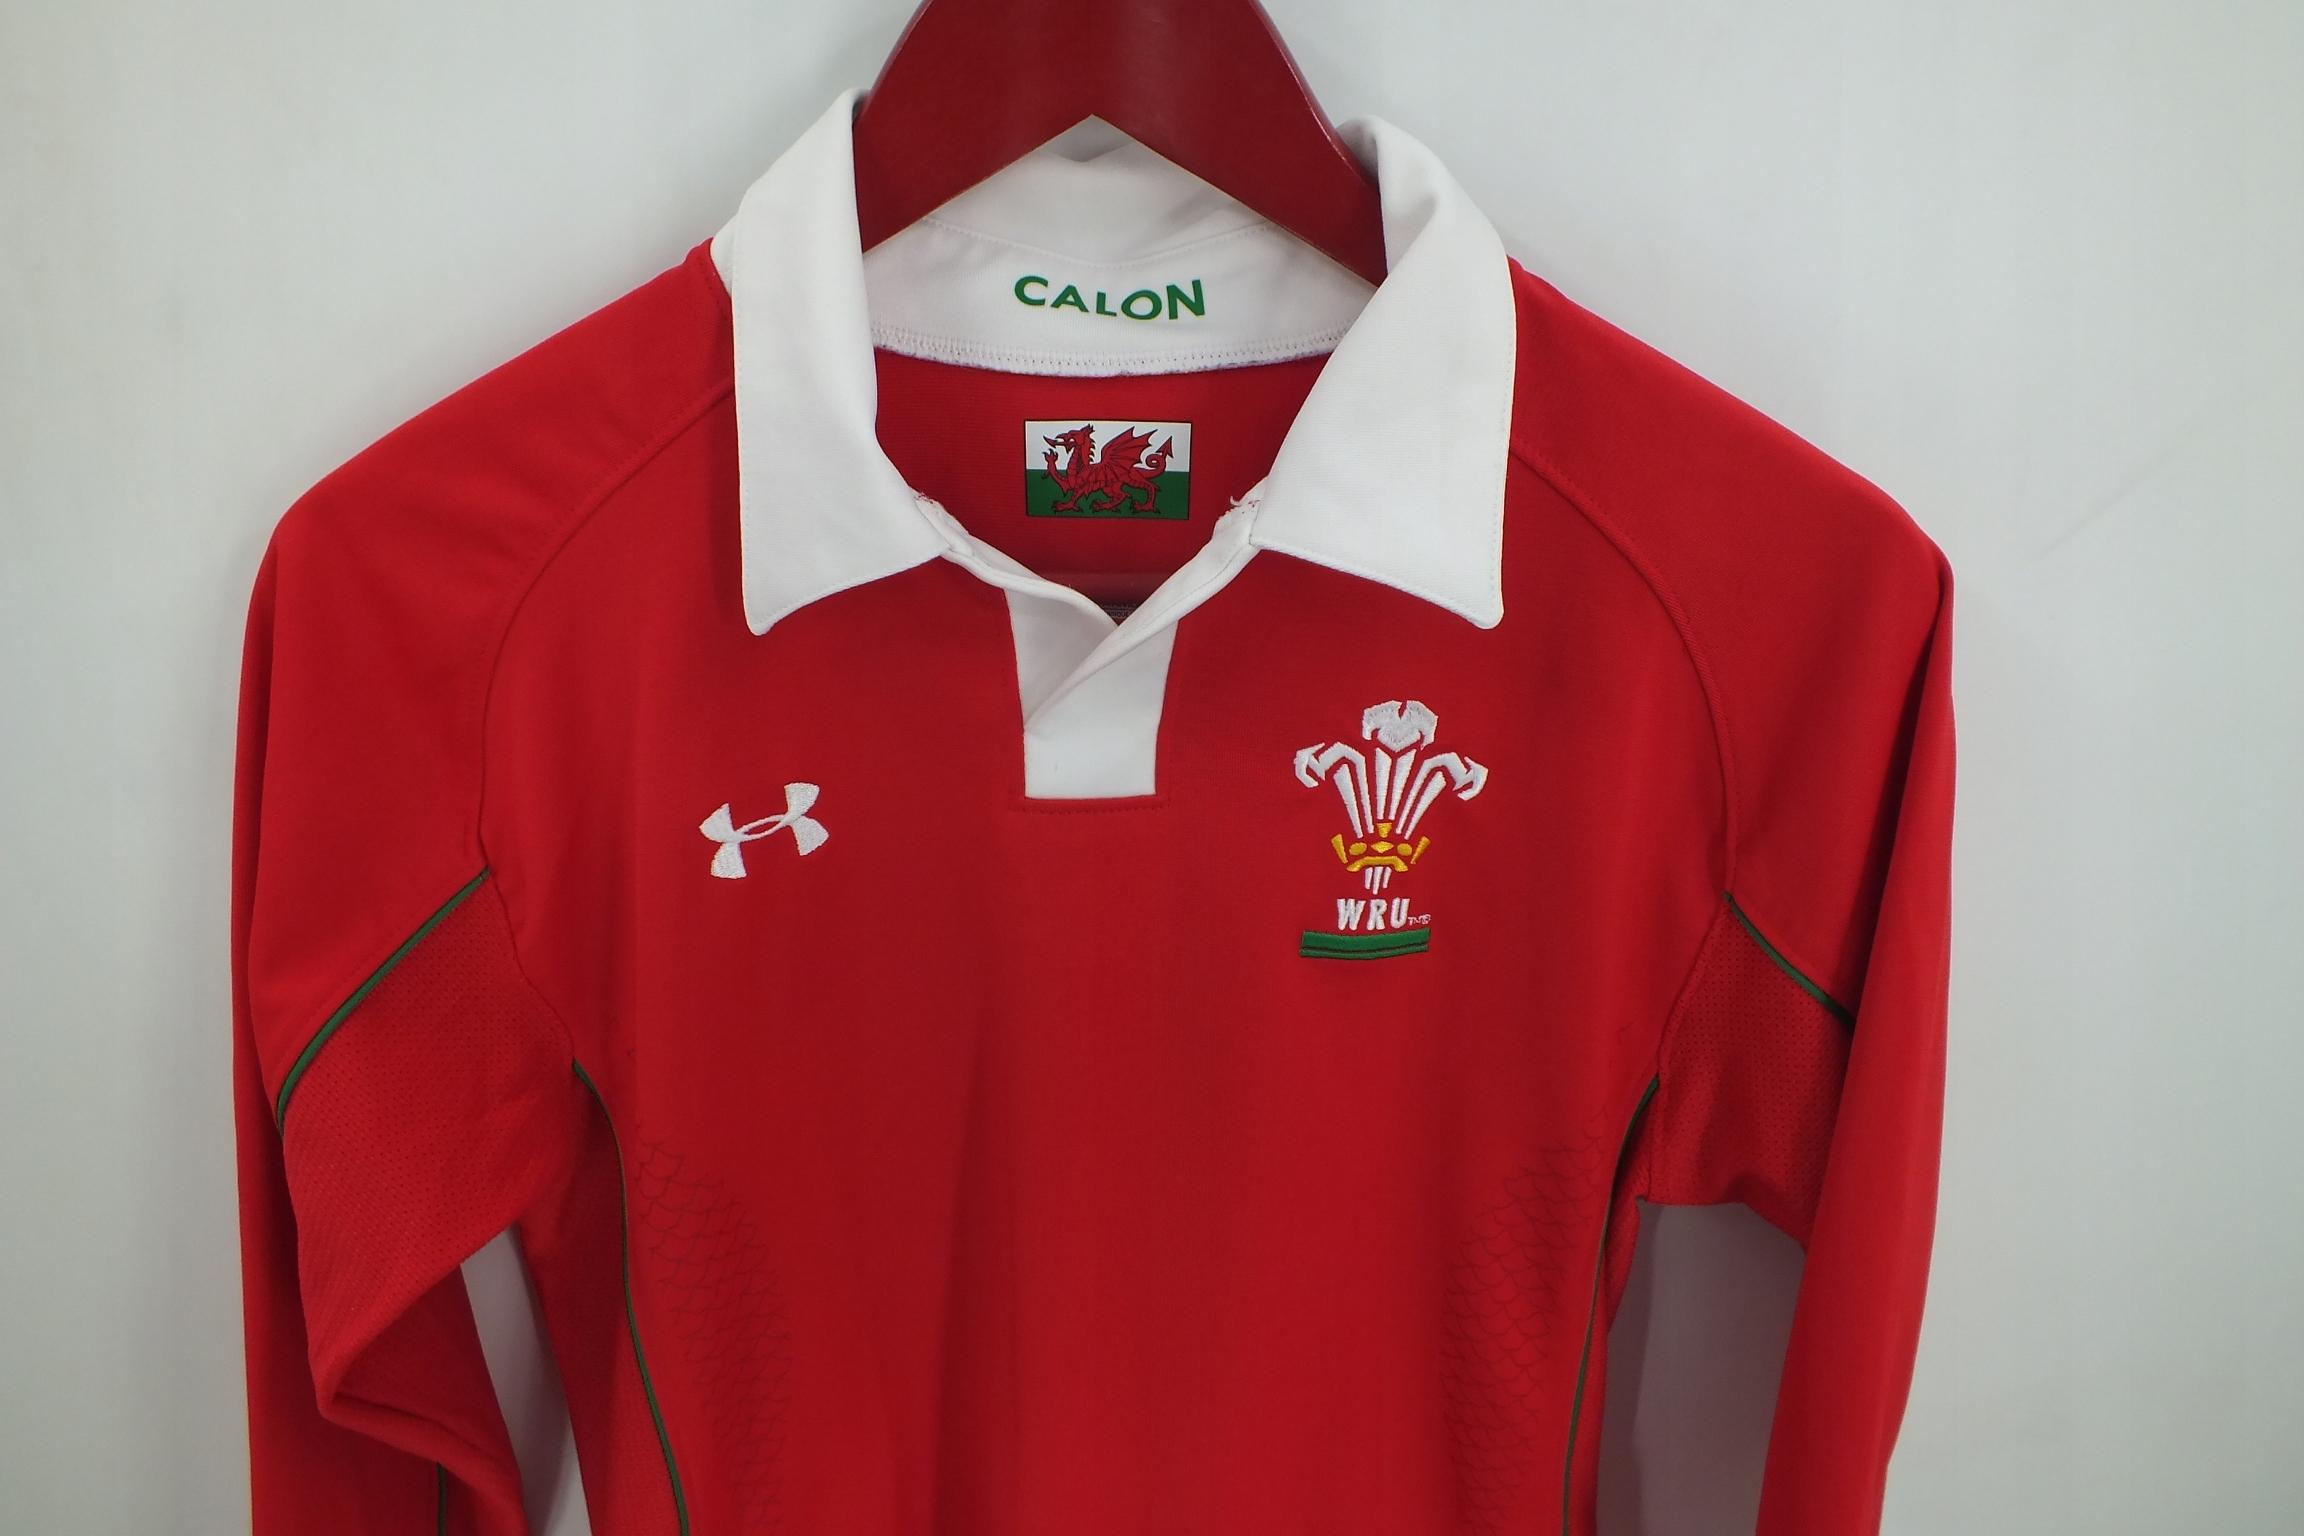 Under Armour Walia Wales Wru koszulka rugby YLG